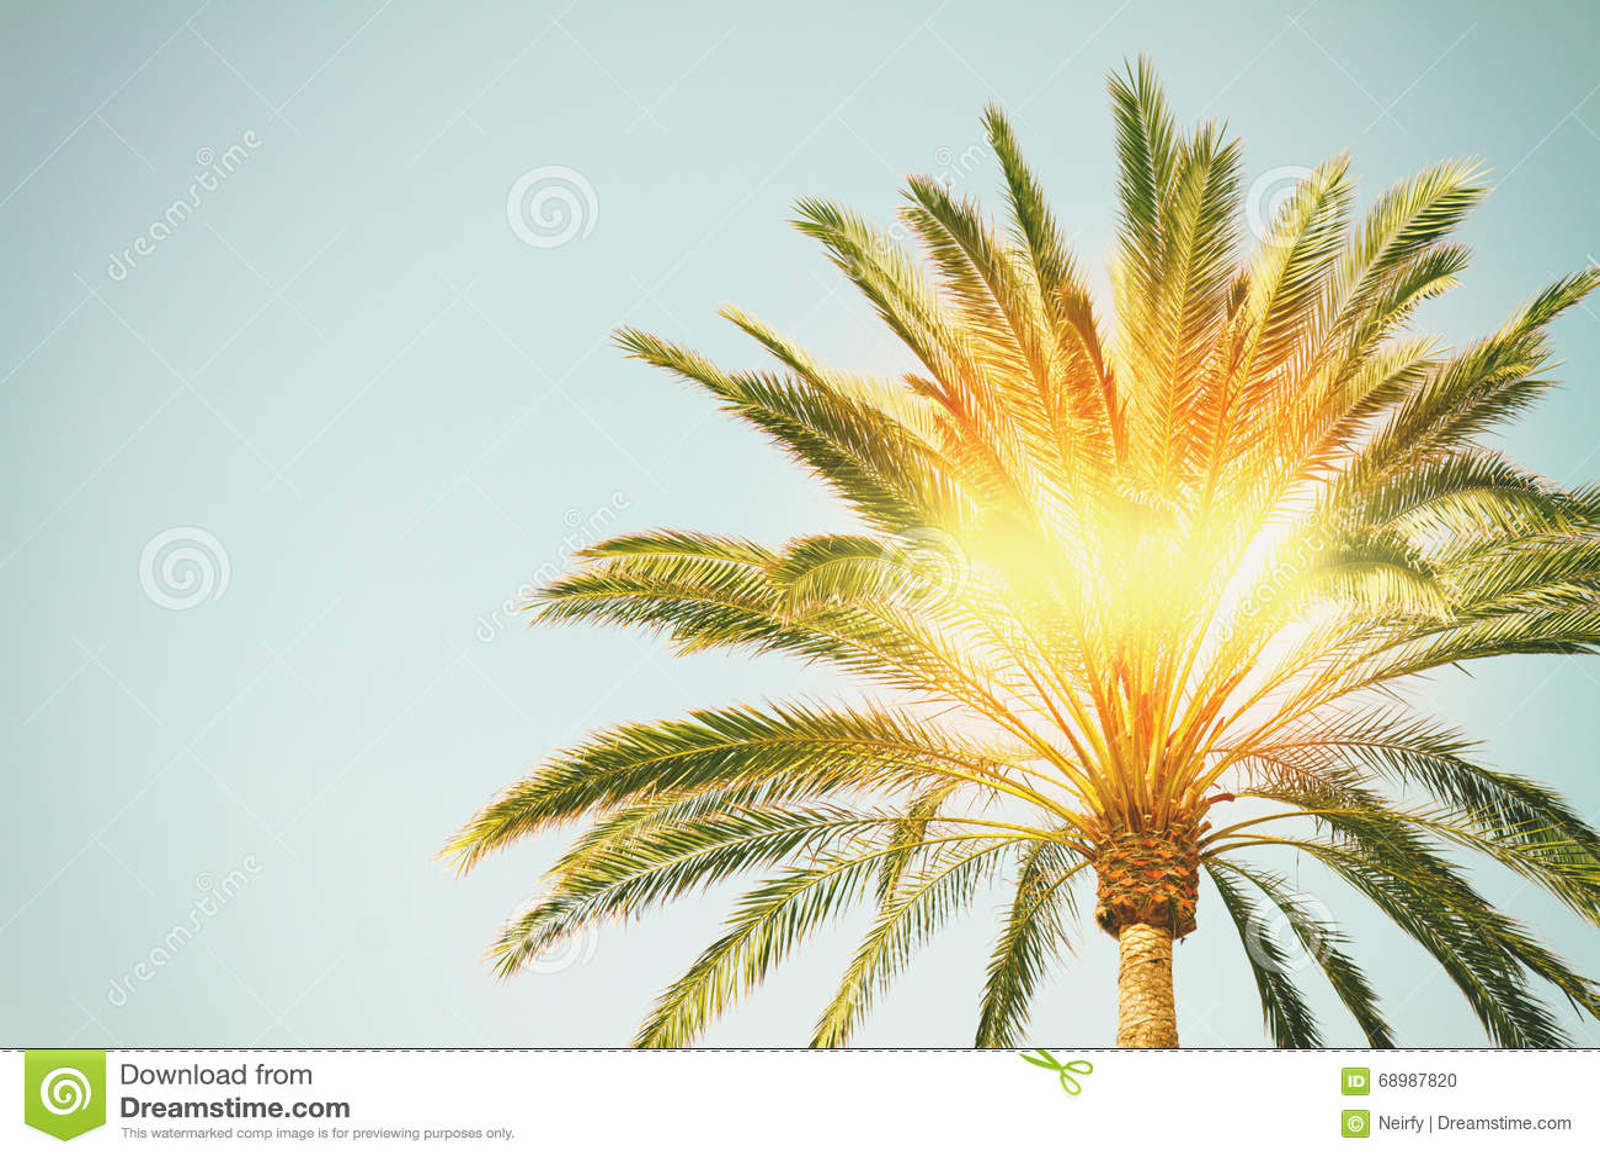 Palm tree with sunshine